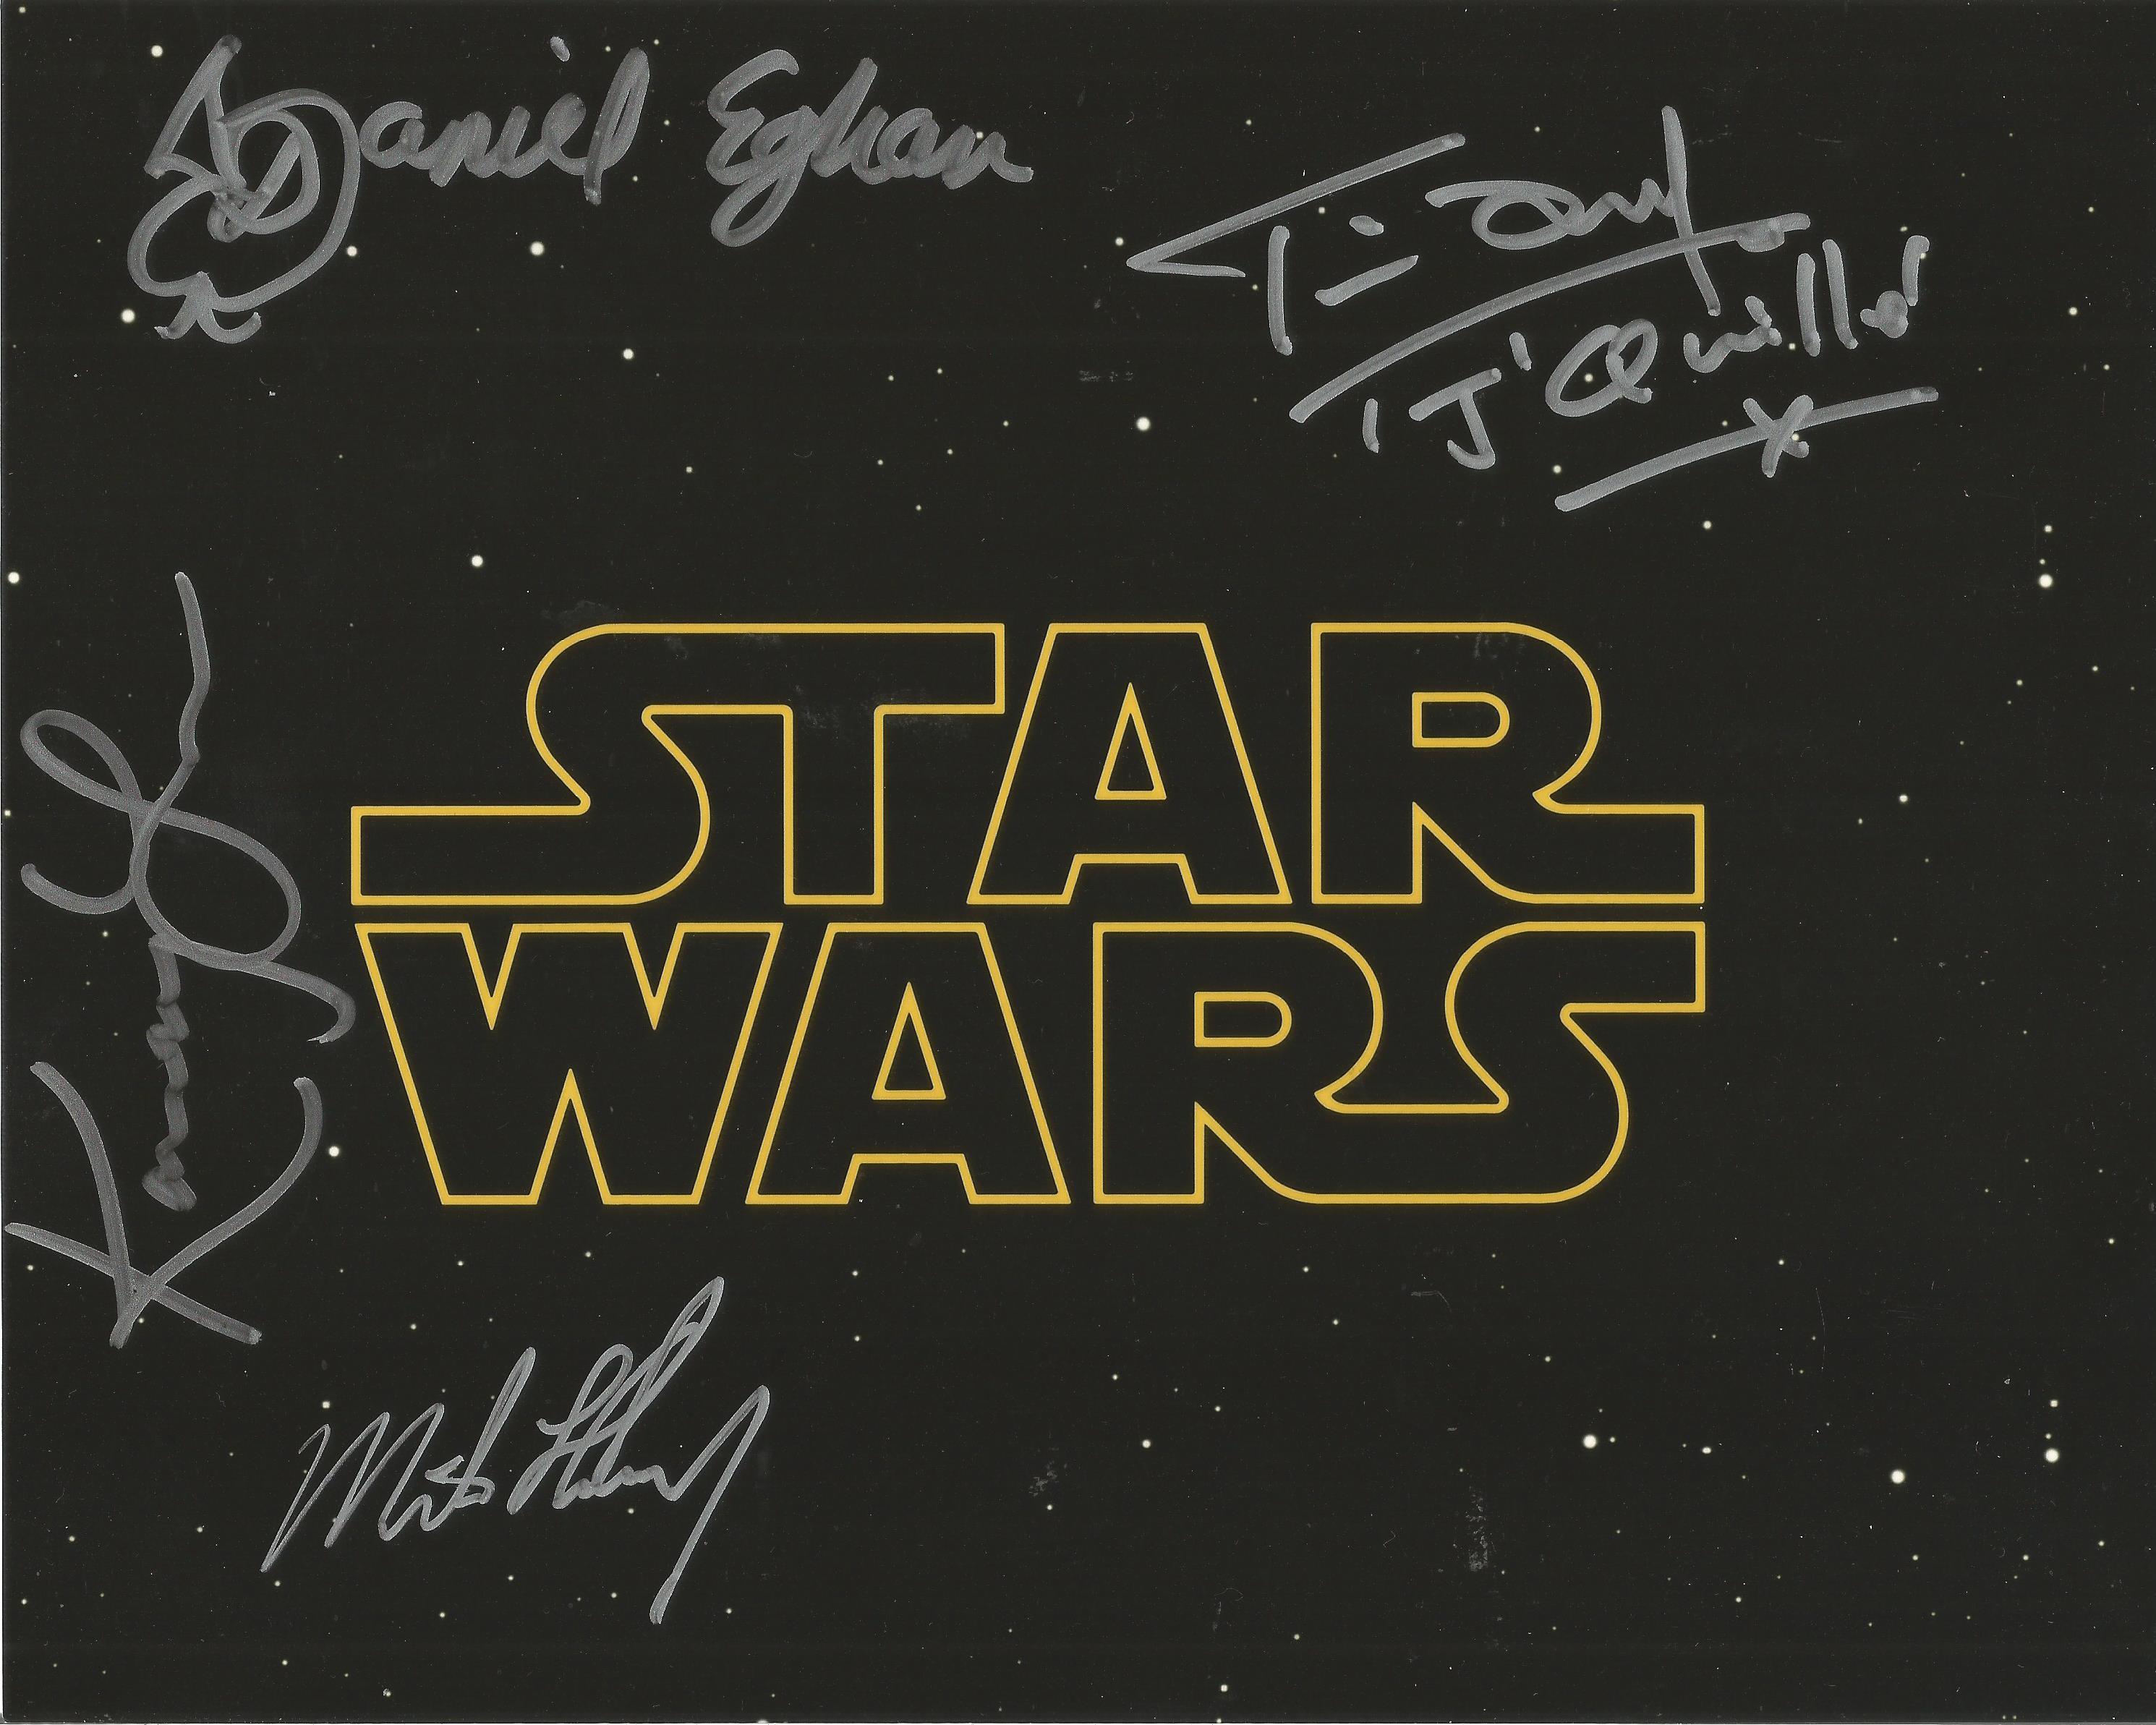 Star Wars multi signed 10x8 colour photo 4 cast members signatures includes Kamay Lau, Daniel